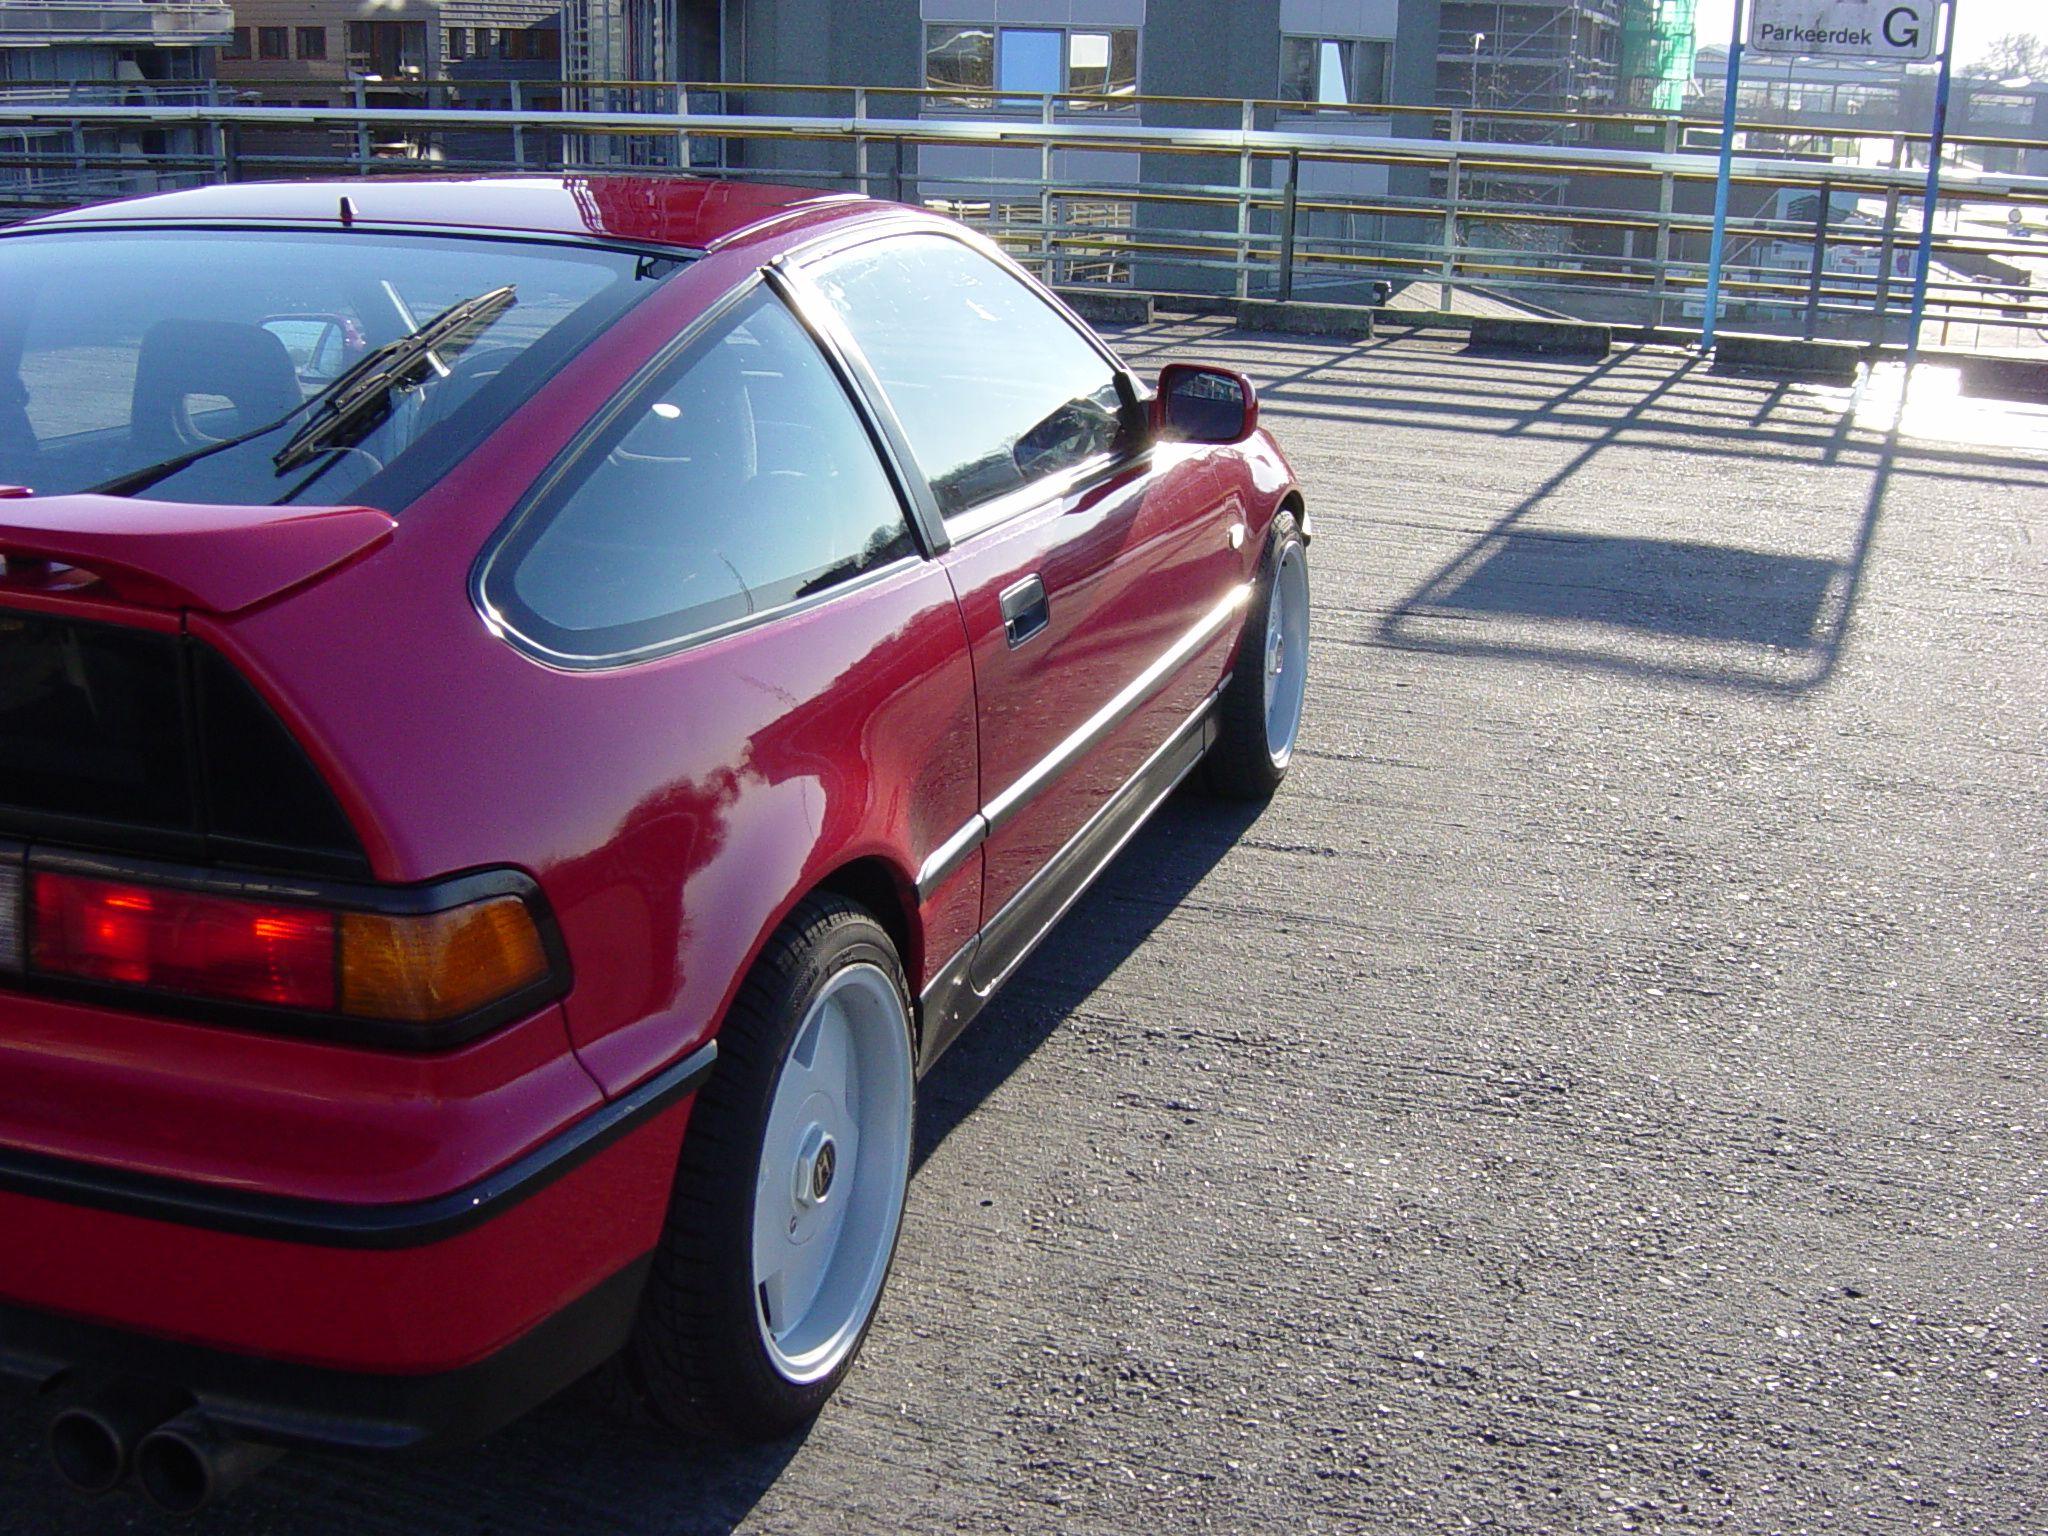 1992 Honda Civic CRX ED9   Honda crx, Honda civic, Honda